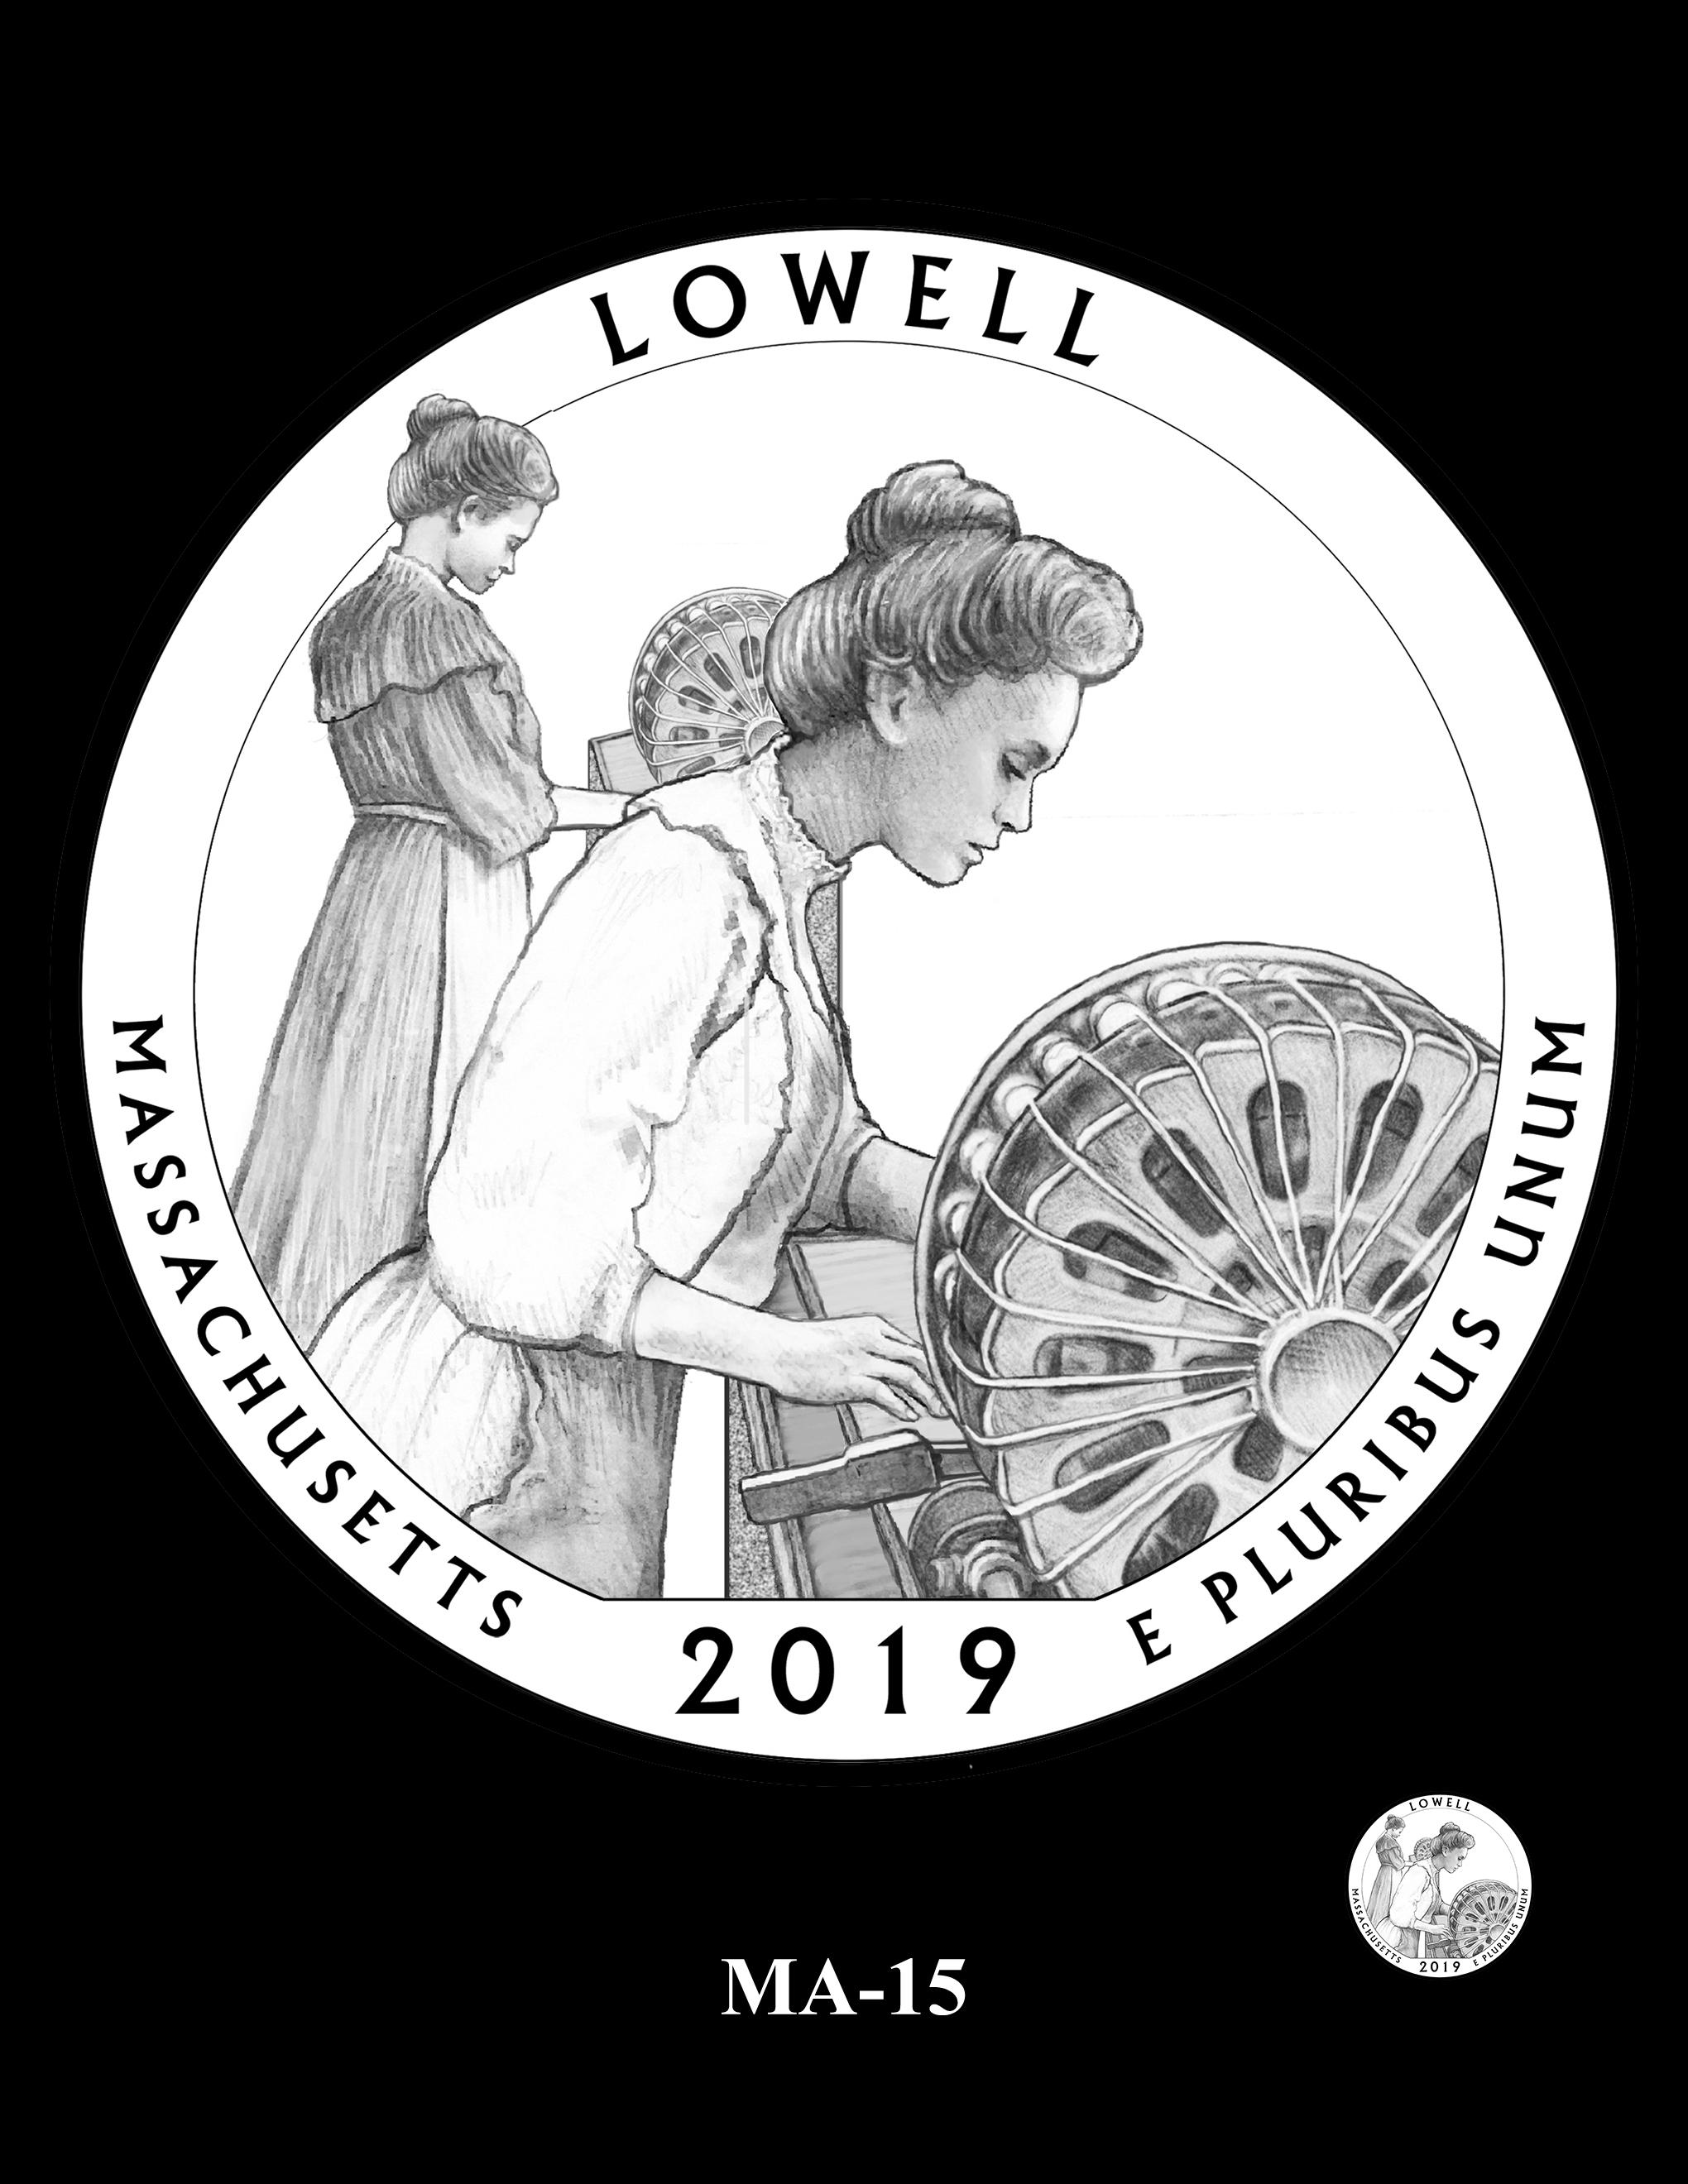 MA-15 -- 2019 America the Beautiful Quarters® Program